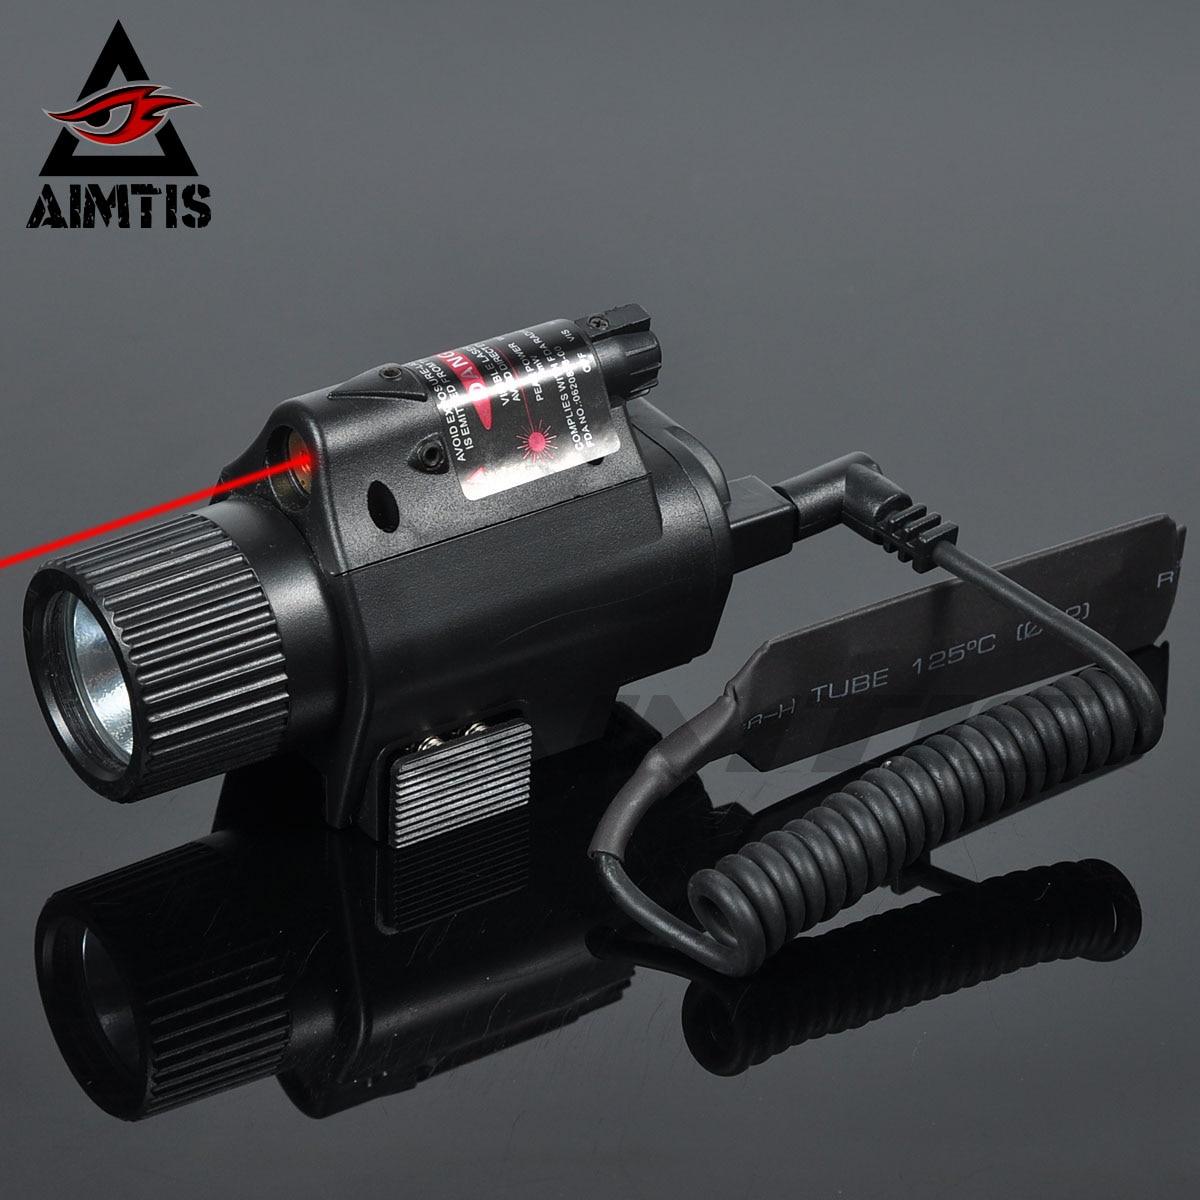 AIMTIS Flashlight Tactical Lighting-Equipment Pistol-Gun Laser Glock Mini Red LED